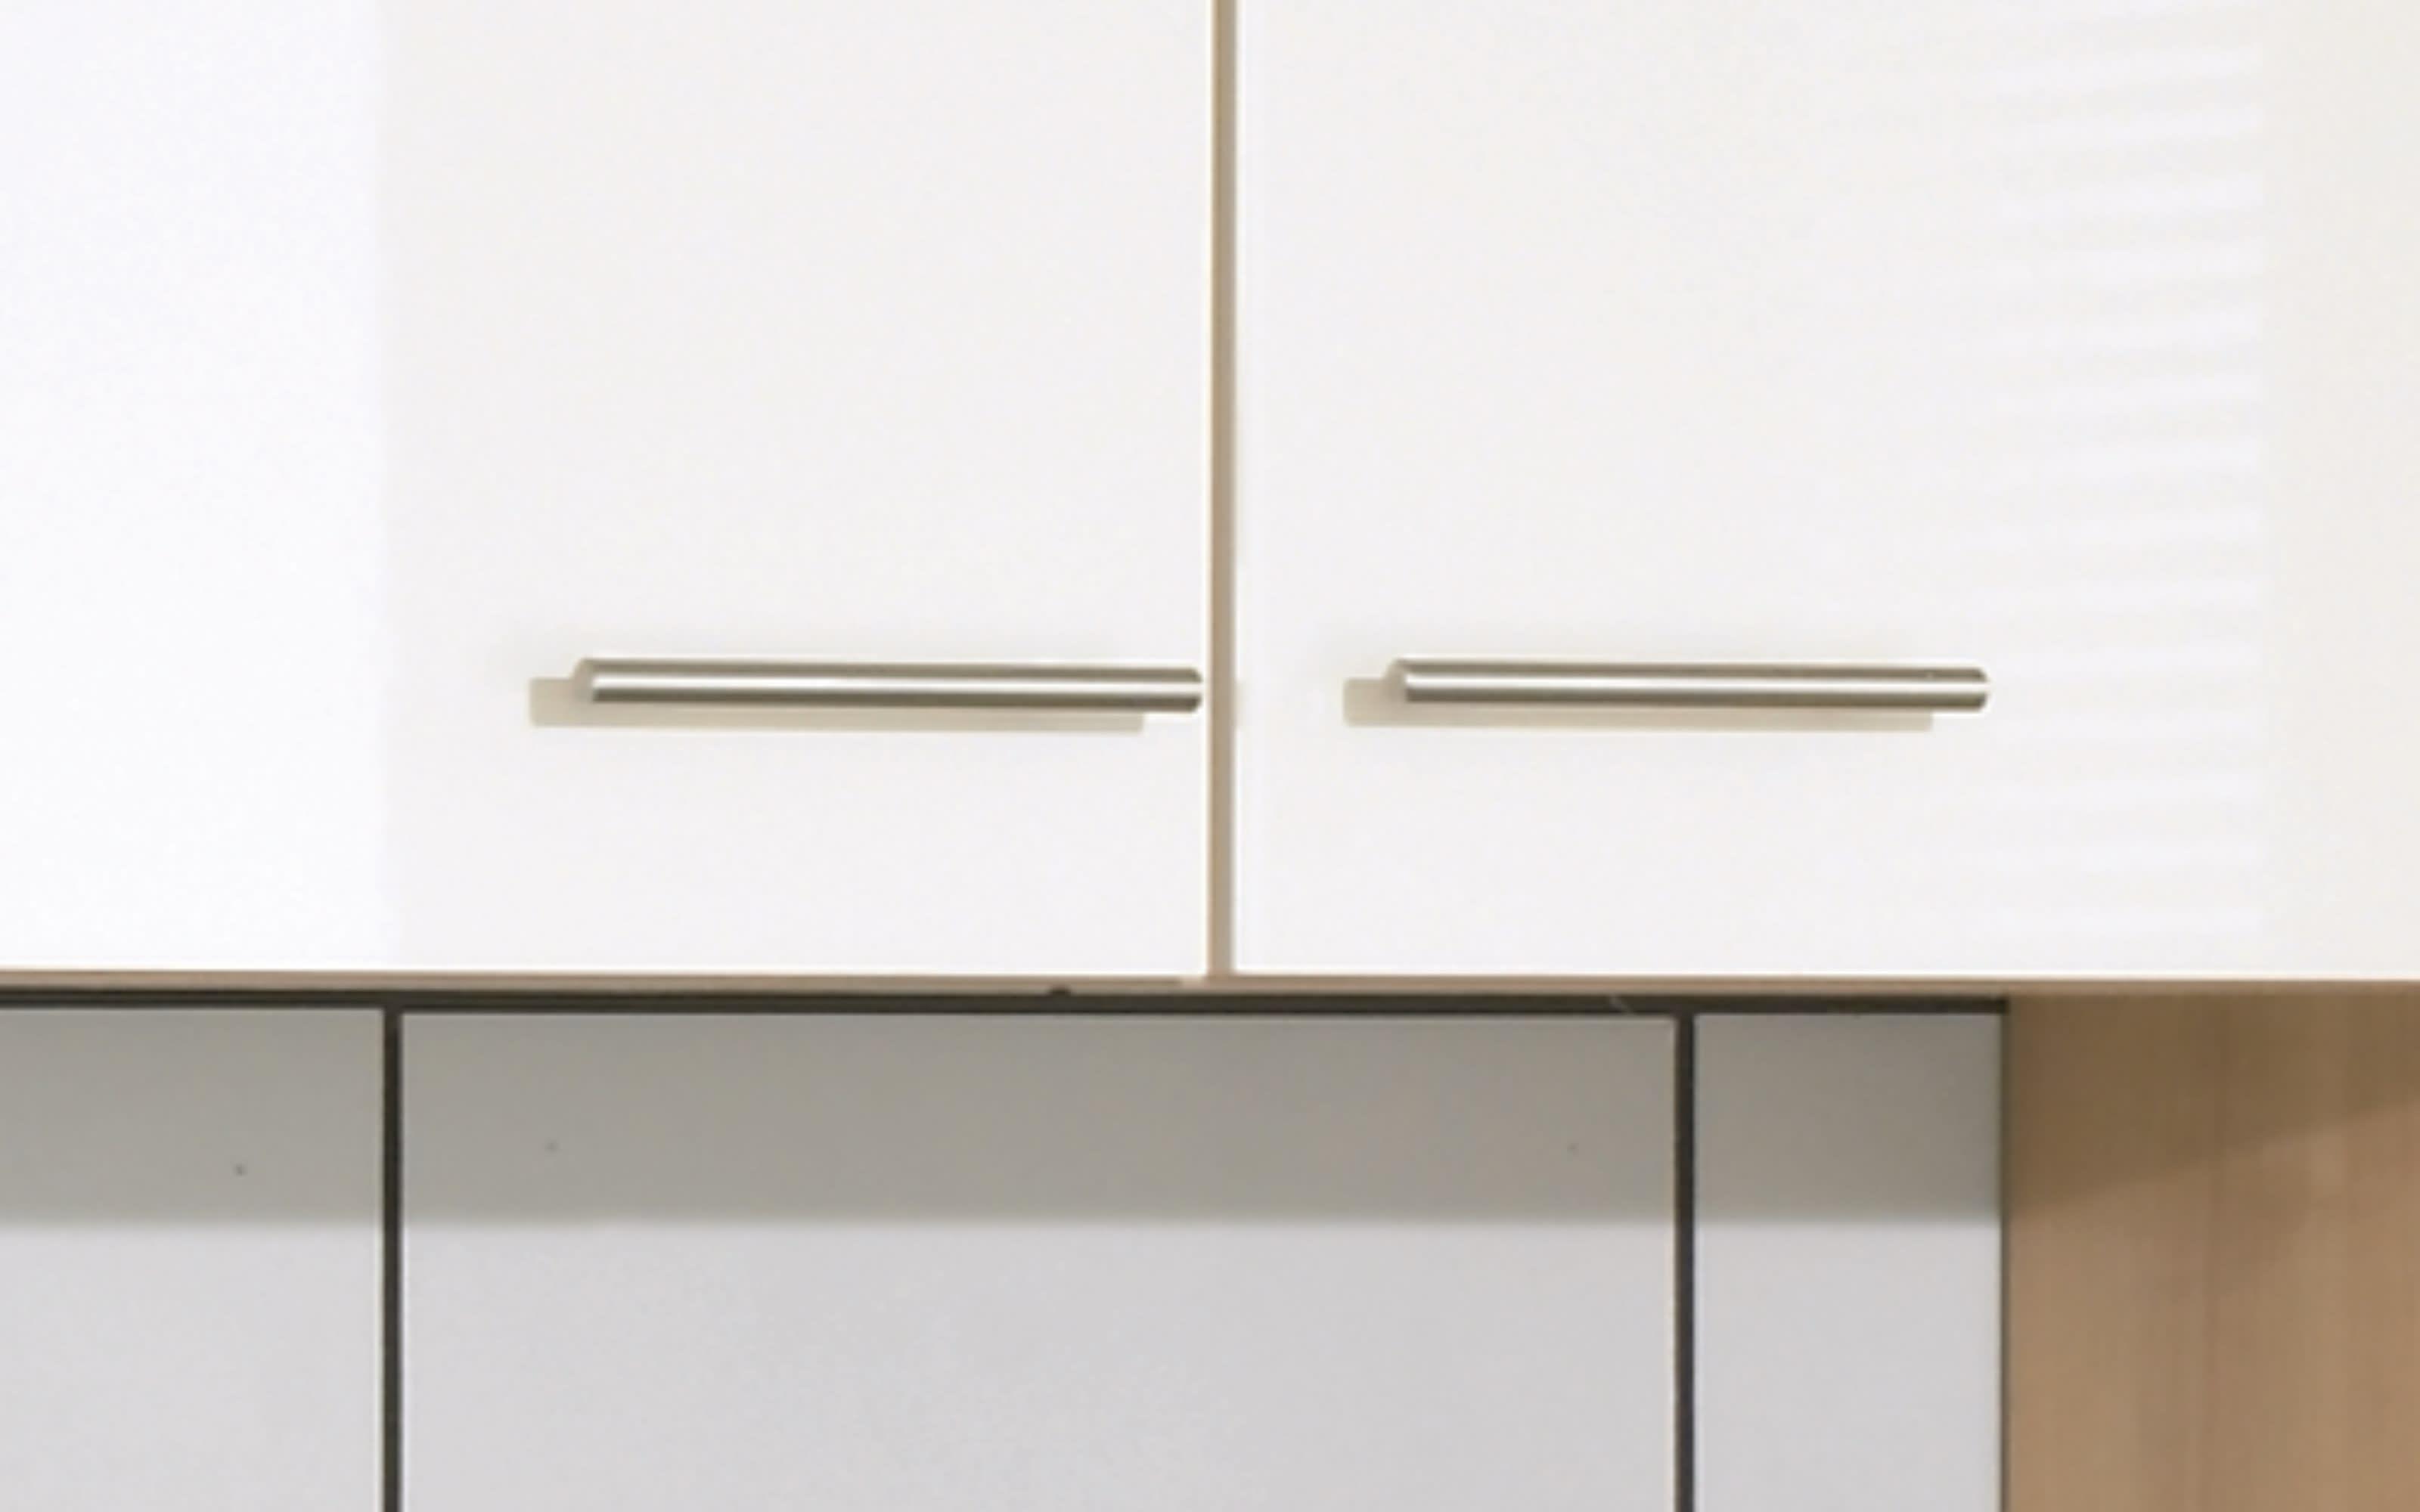 Einbauküche Focus, Lack magnolia Hochglanz, inklusive AEG Elektrogeräte